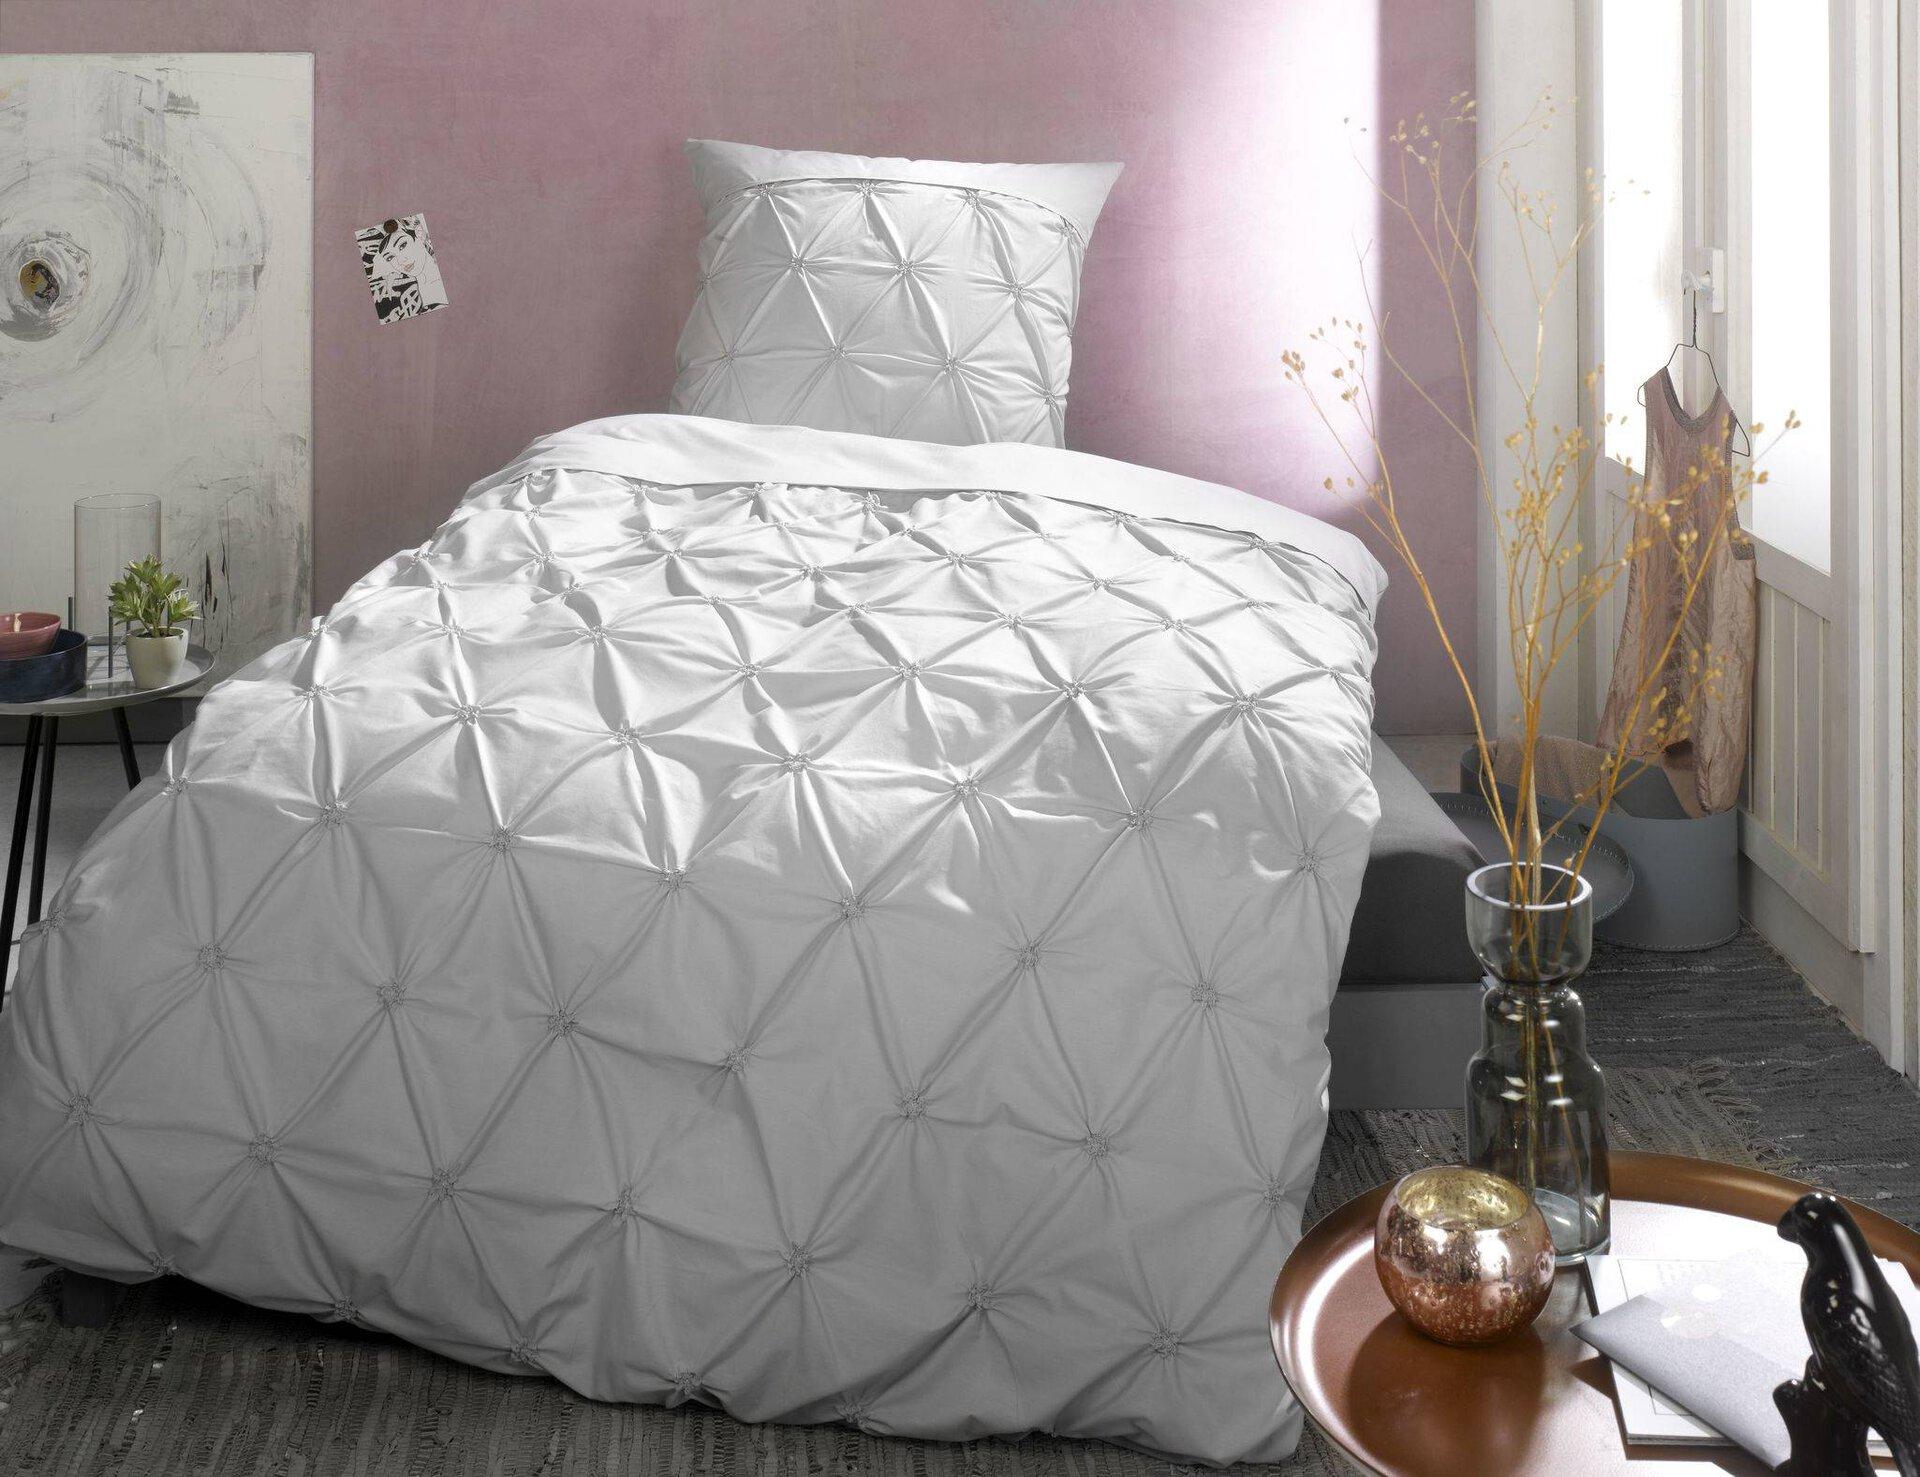 Bettwäsche ProNight Pro Night Textil grau 135 x 200 cm